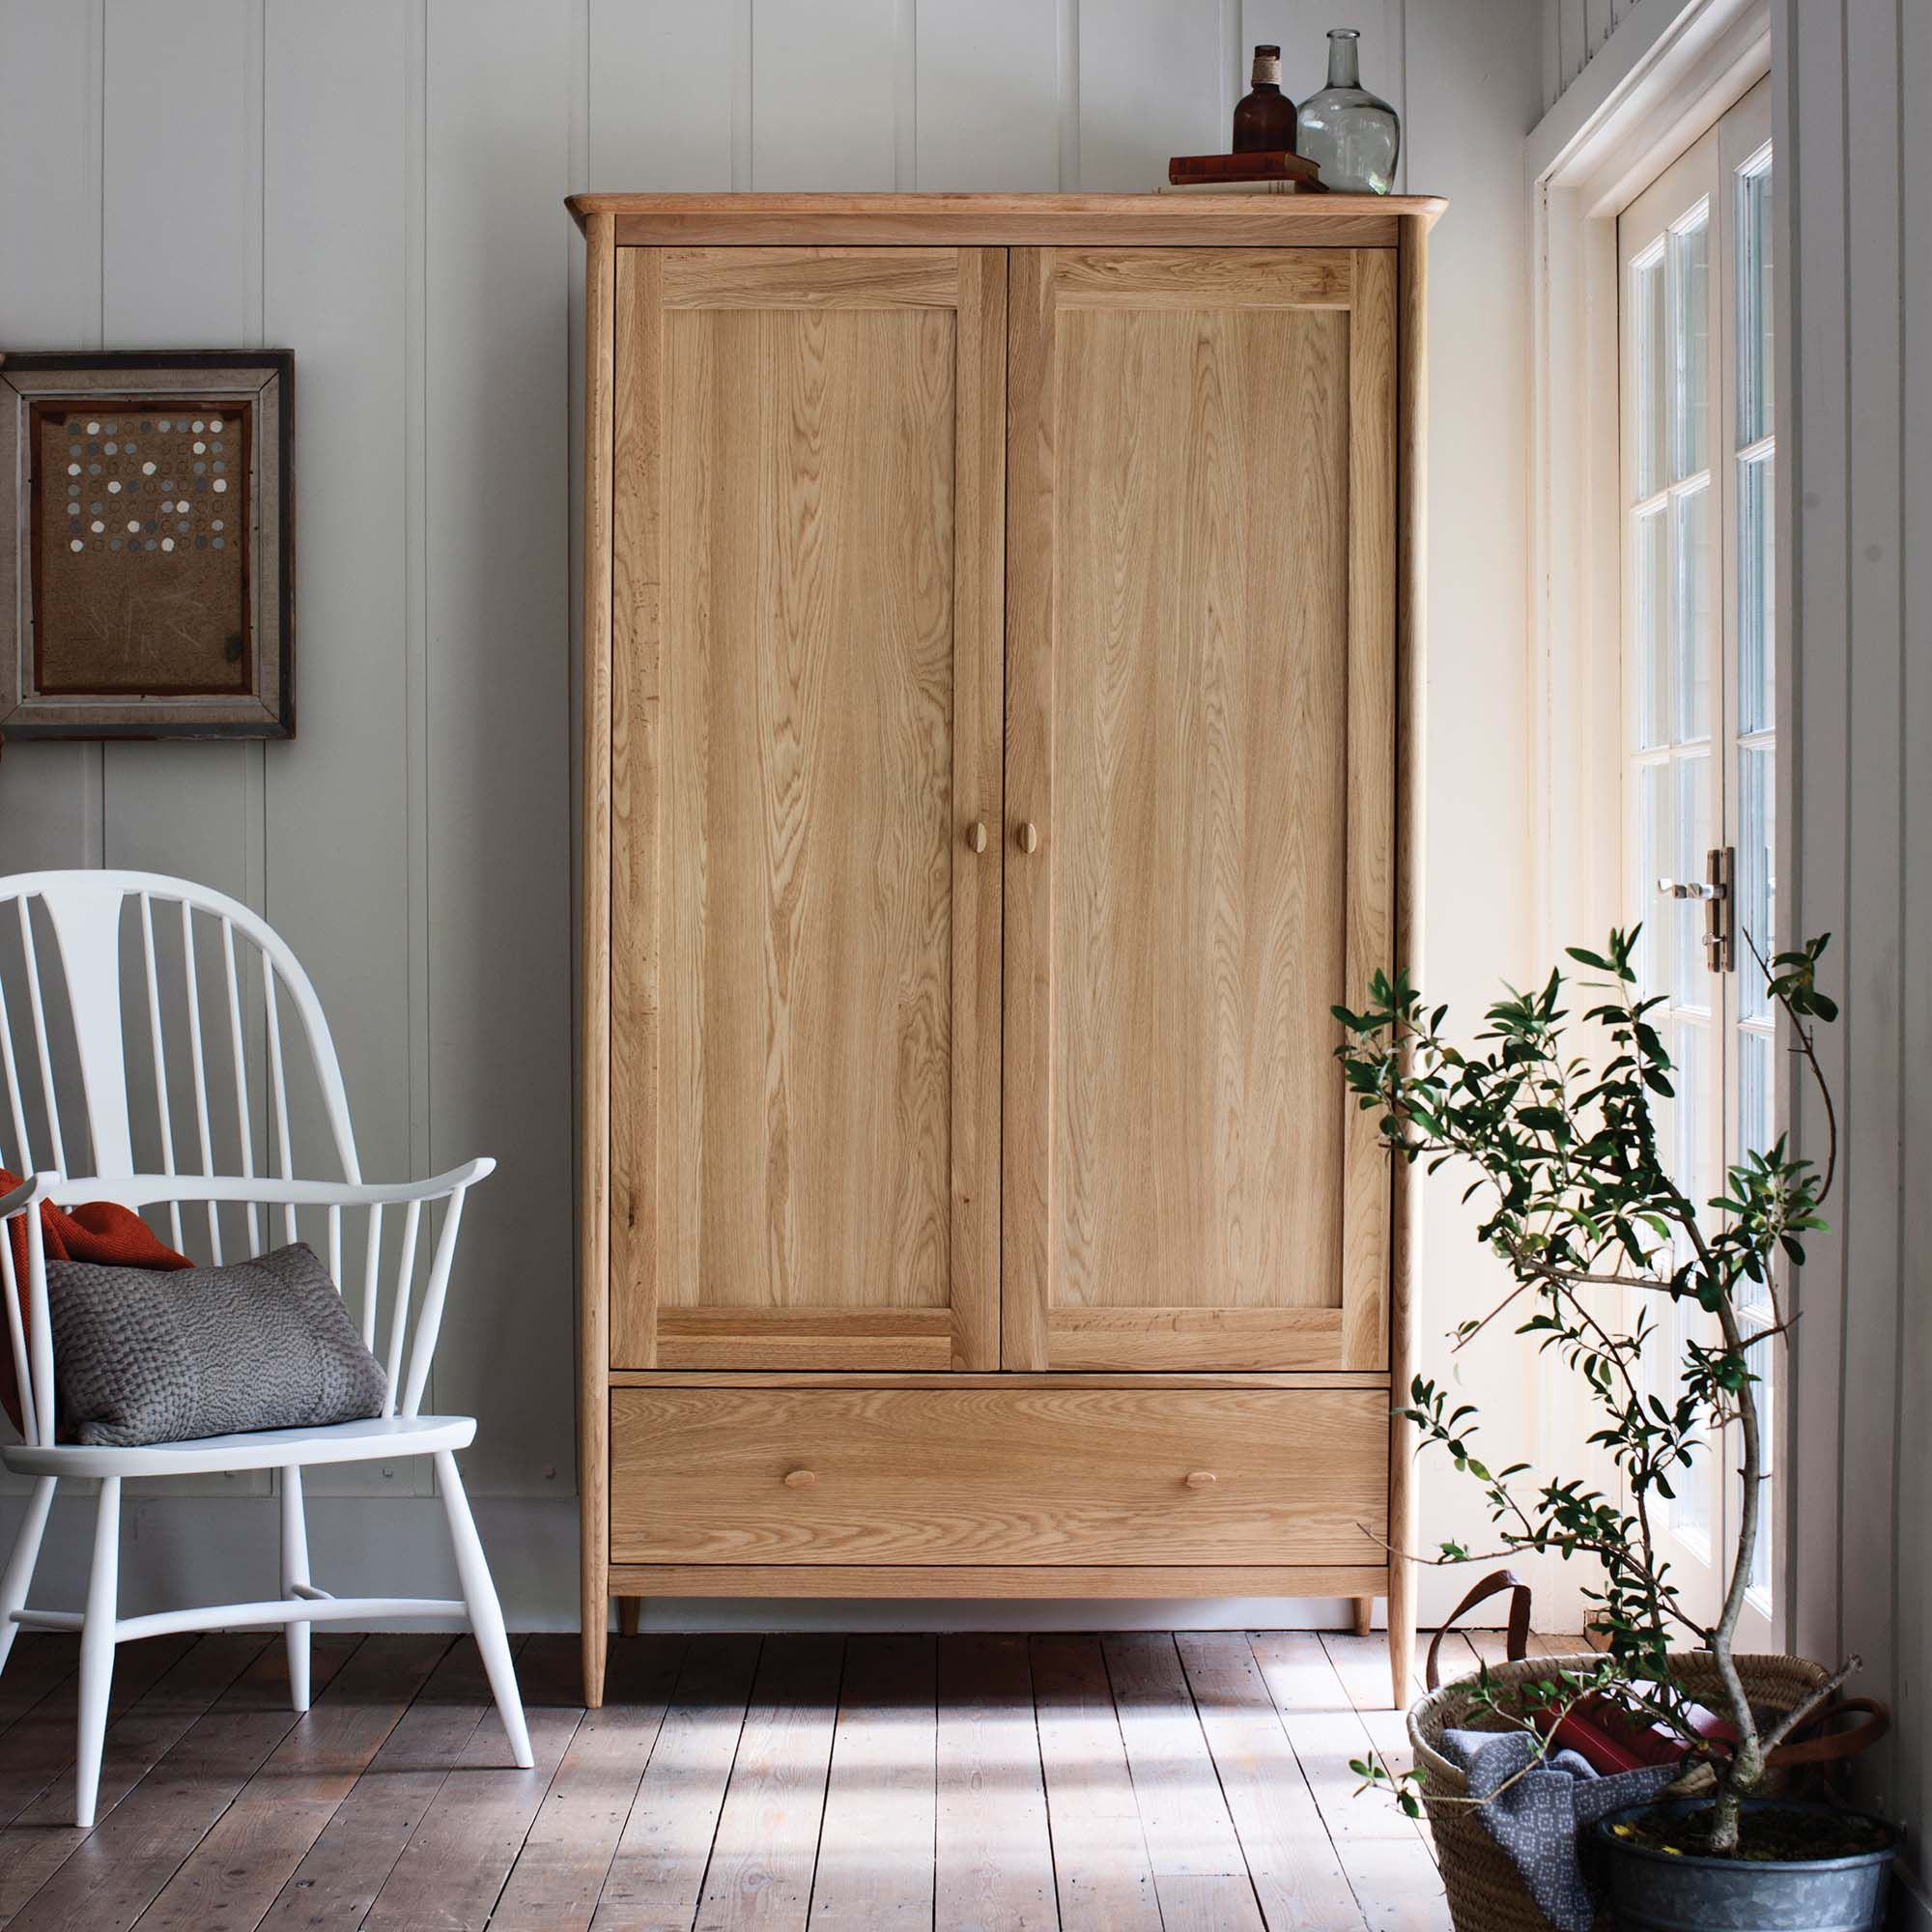 Ercol teramo door wardrobe oak wardrobes bedroom in